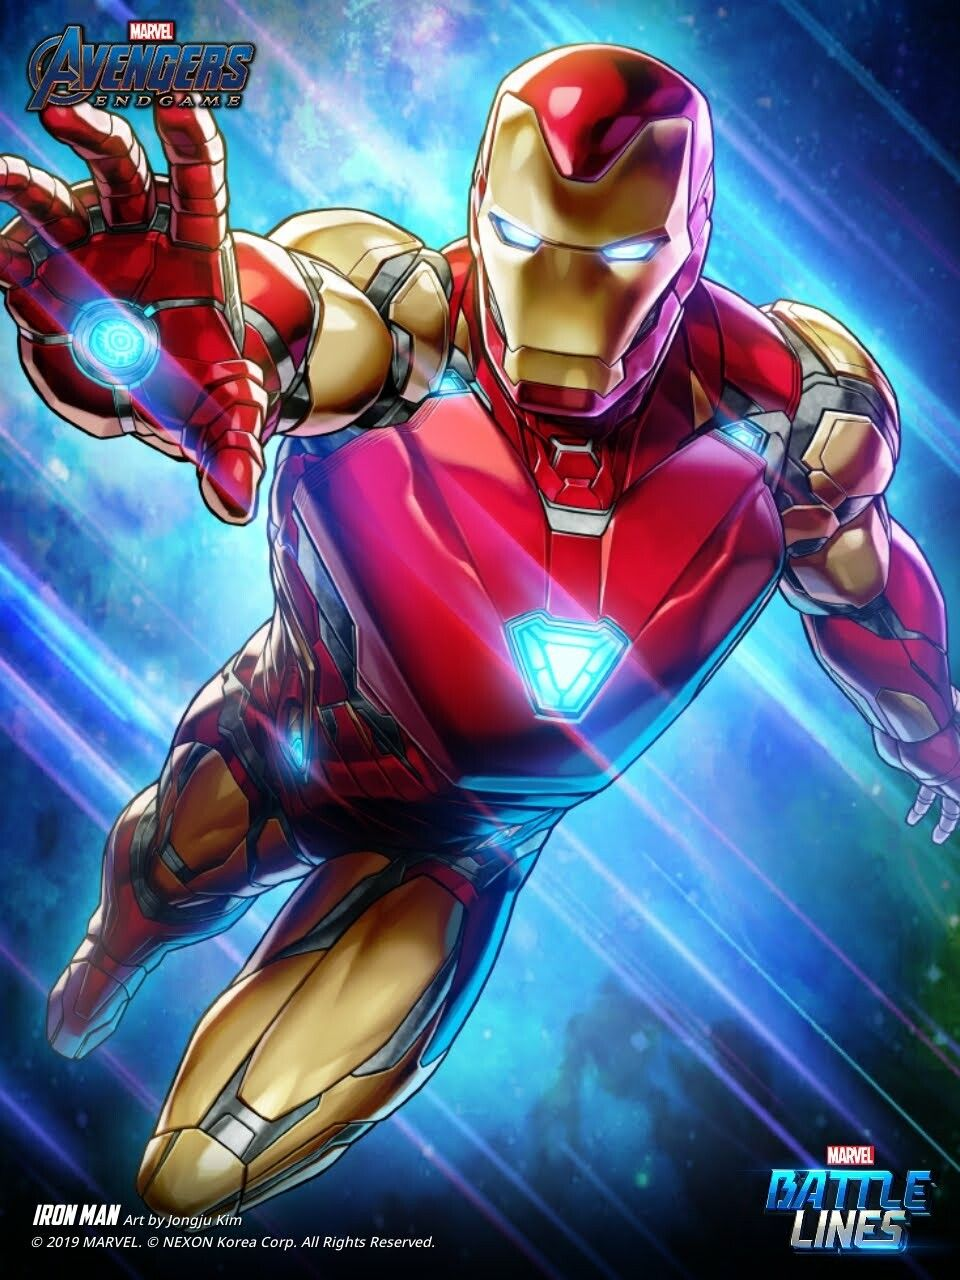 Artstation Marvel Battle Lines Artwork Iron Man Mark 85 Endgame Haje 714 Iron Man Comic Iron Man Mark 85 Iron Man Art